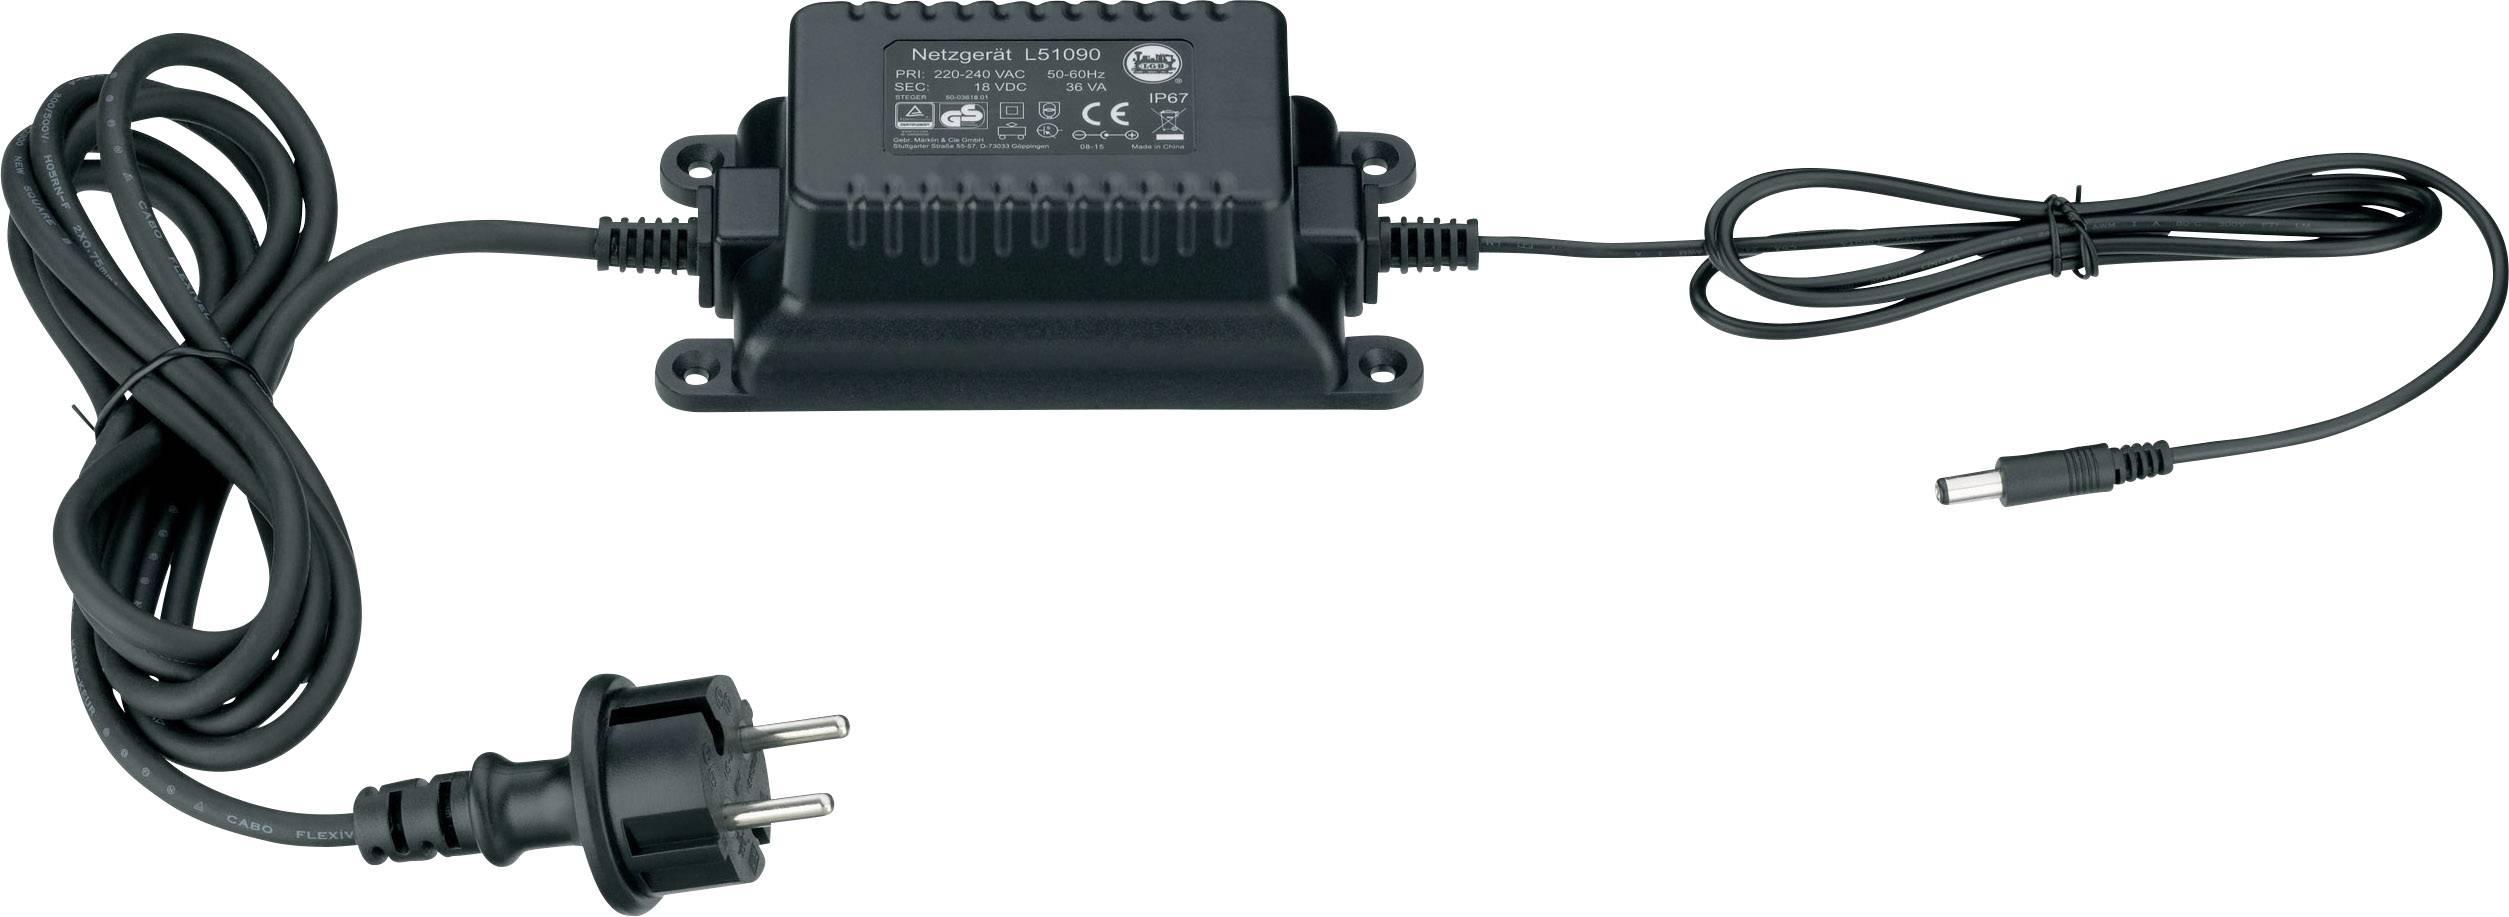 Stabilisiertes Netzteil Transformator Schalter Trimmer 220v-12v 10a 10 A Sc0